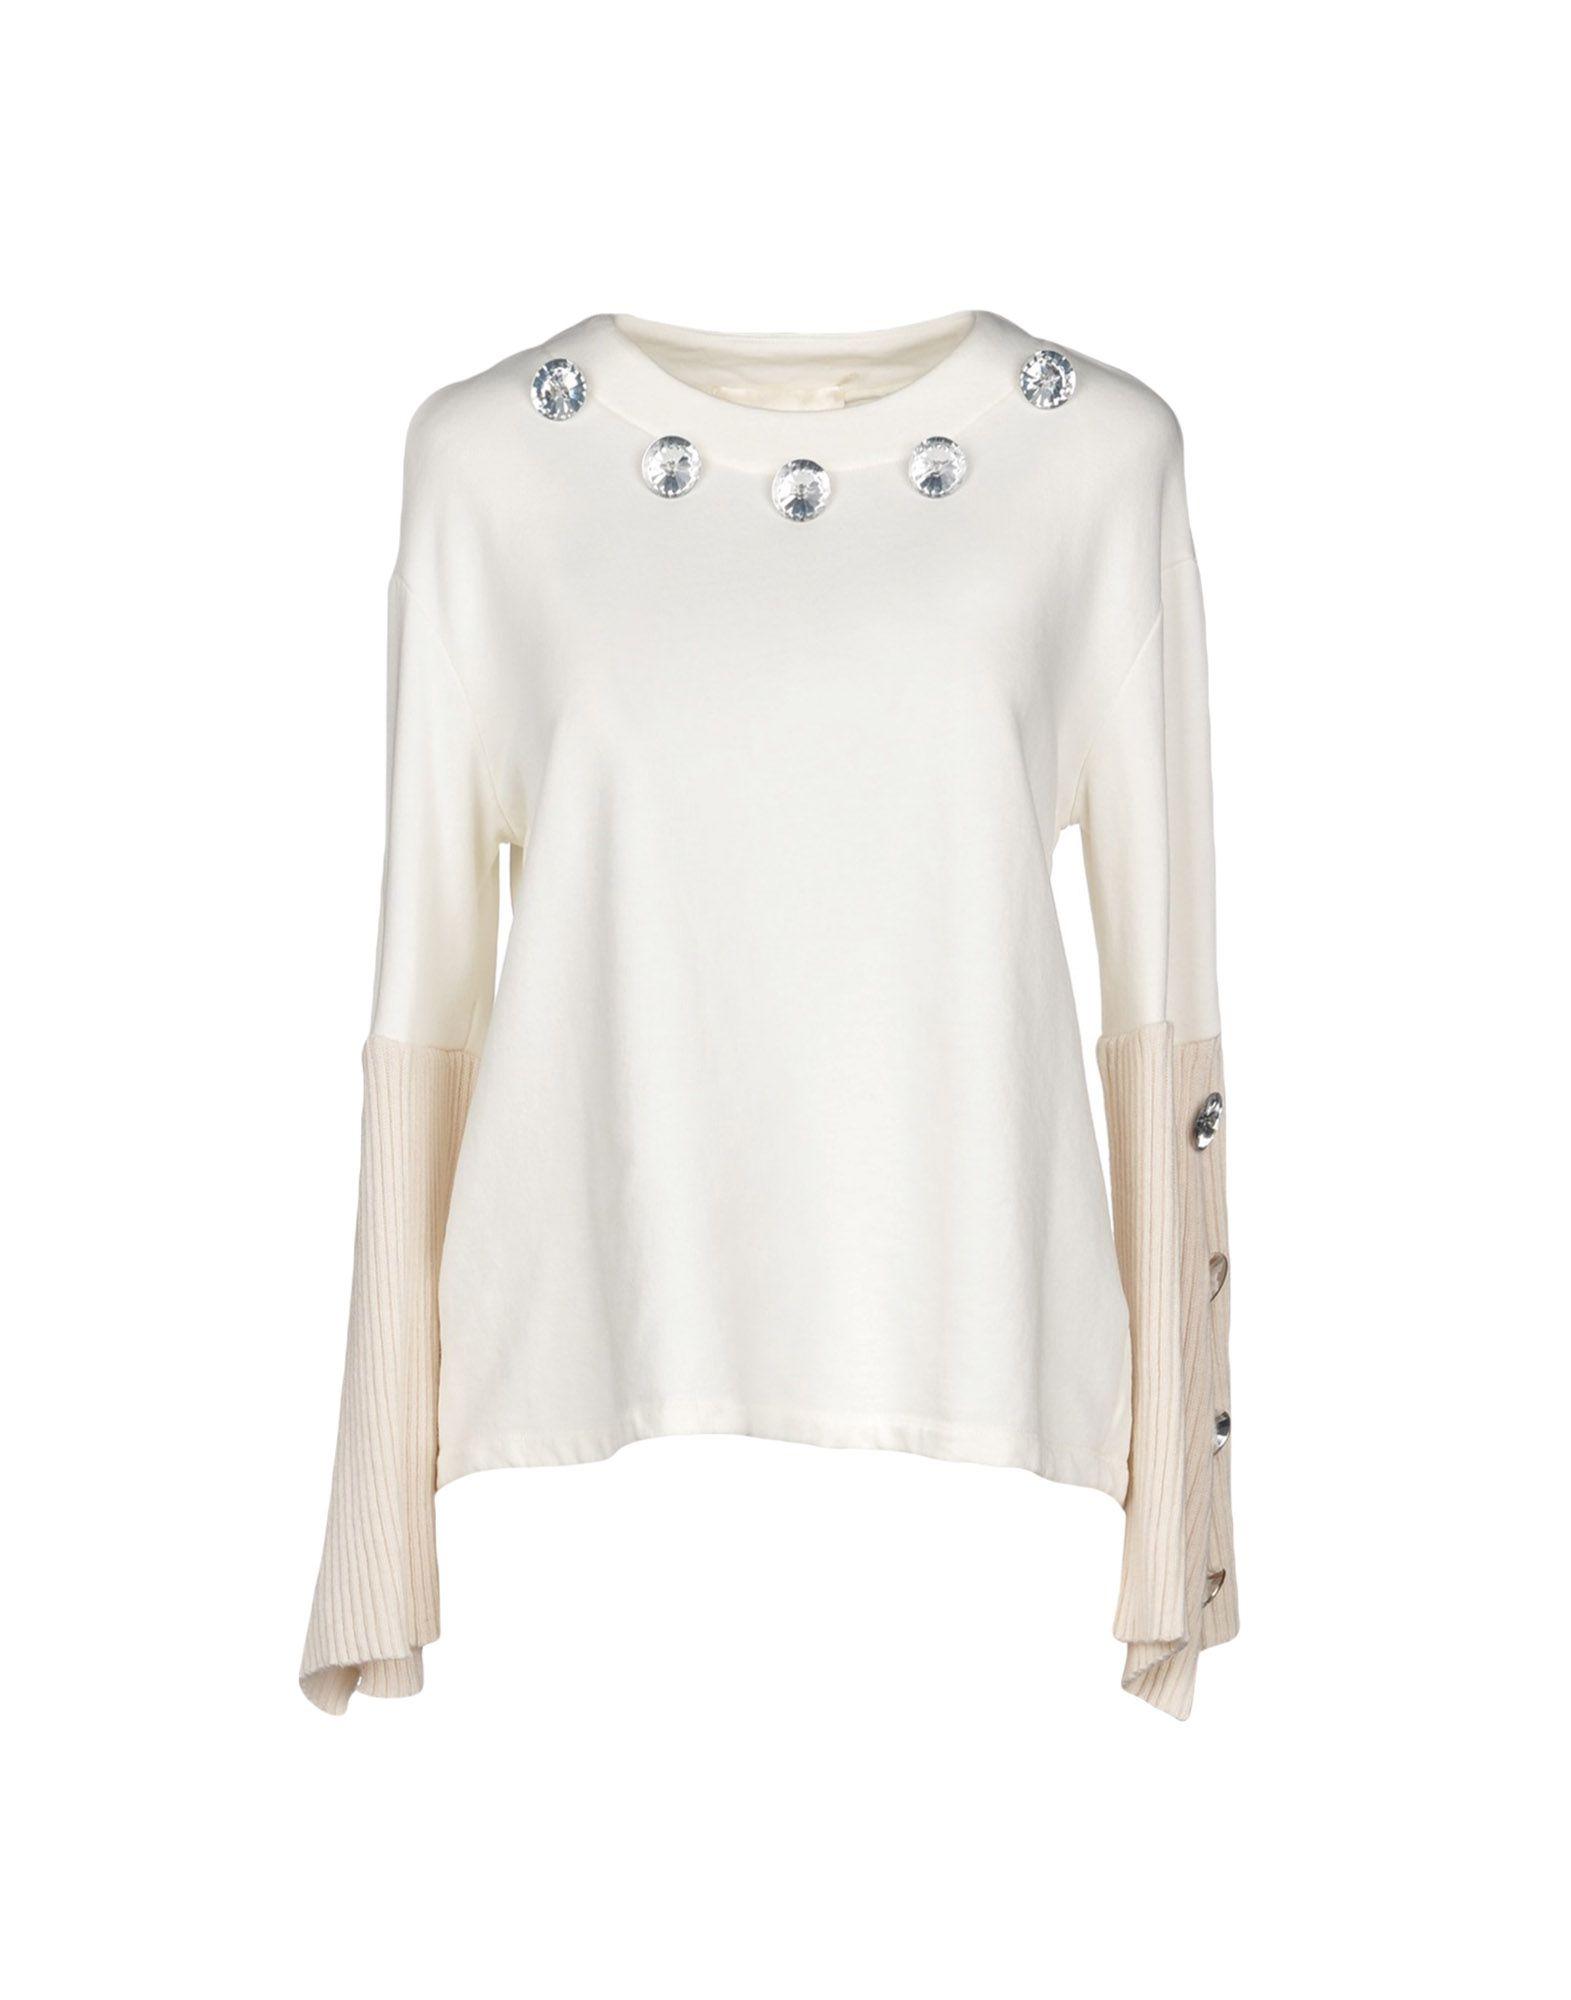 TILL.DA Sweatshirt in White